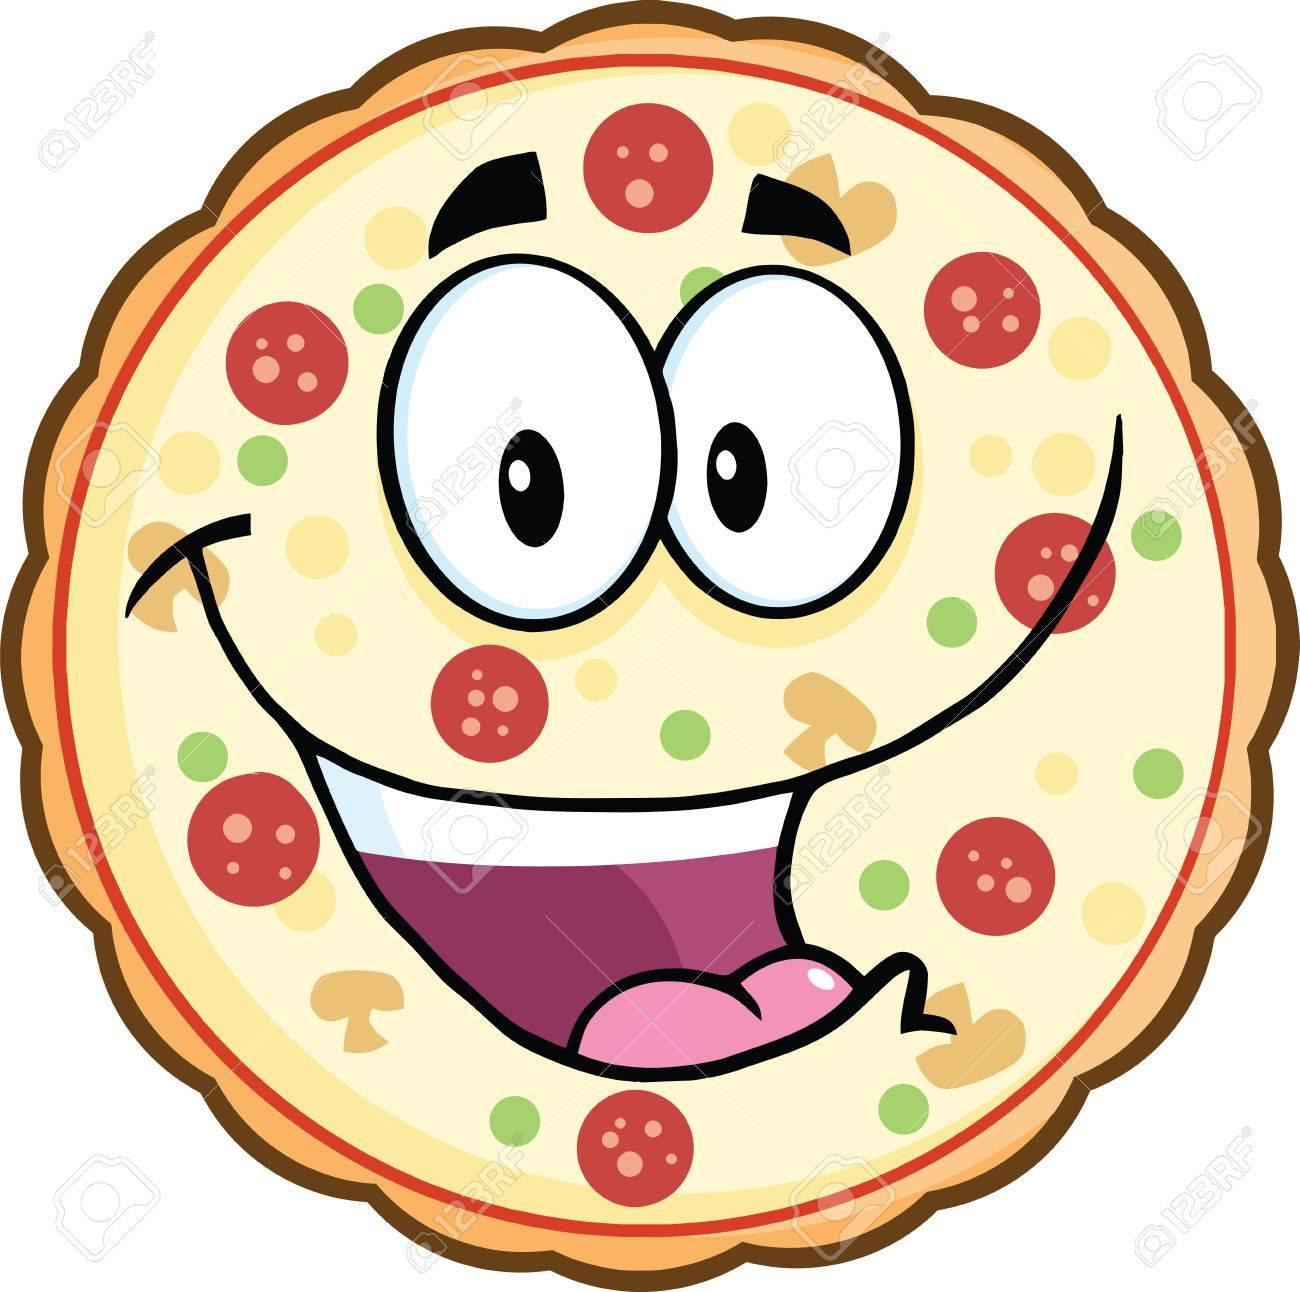 1300x1292 Funny Pizza Cartoon Mascot Character Illustration Isolated